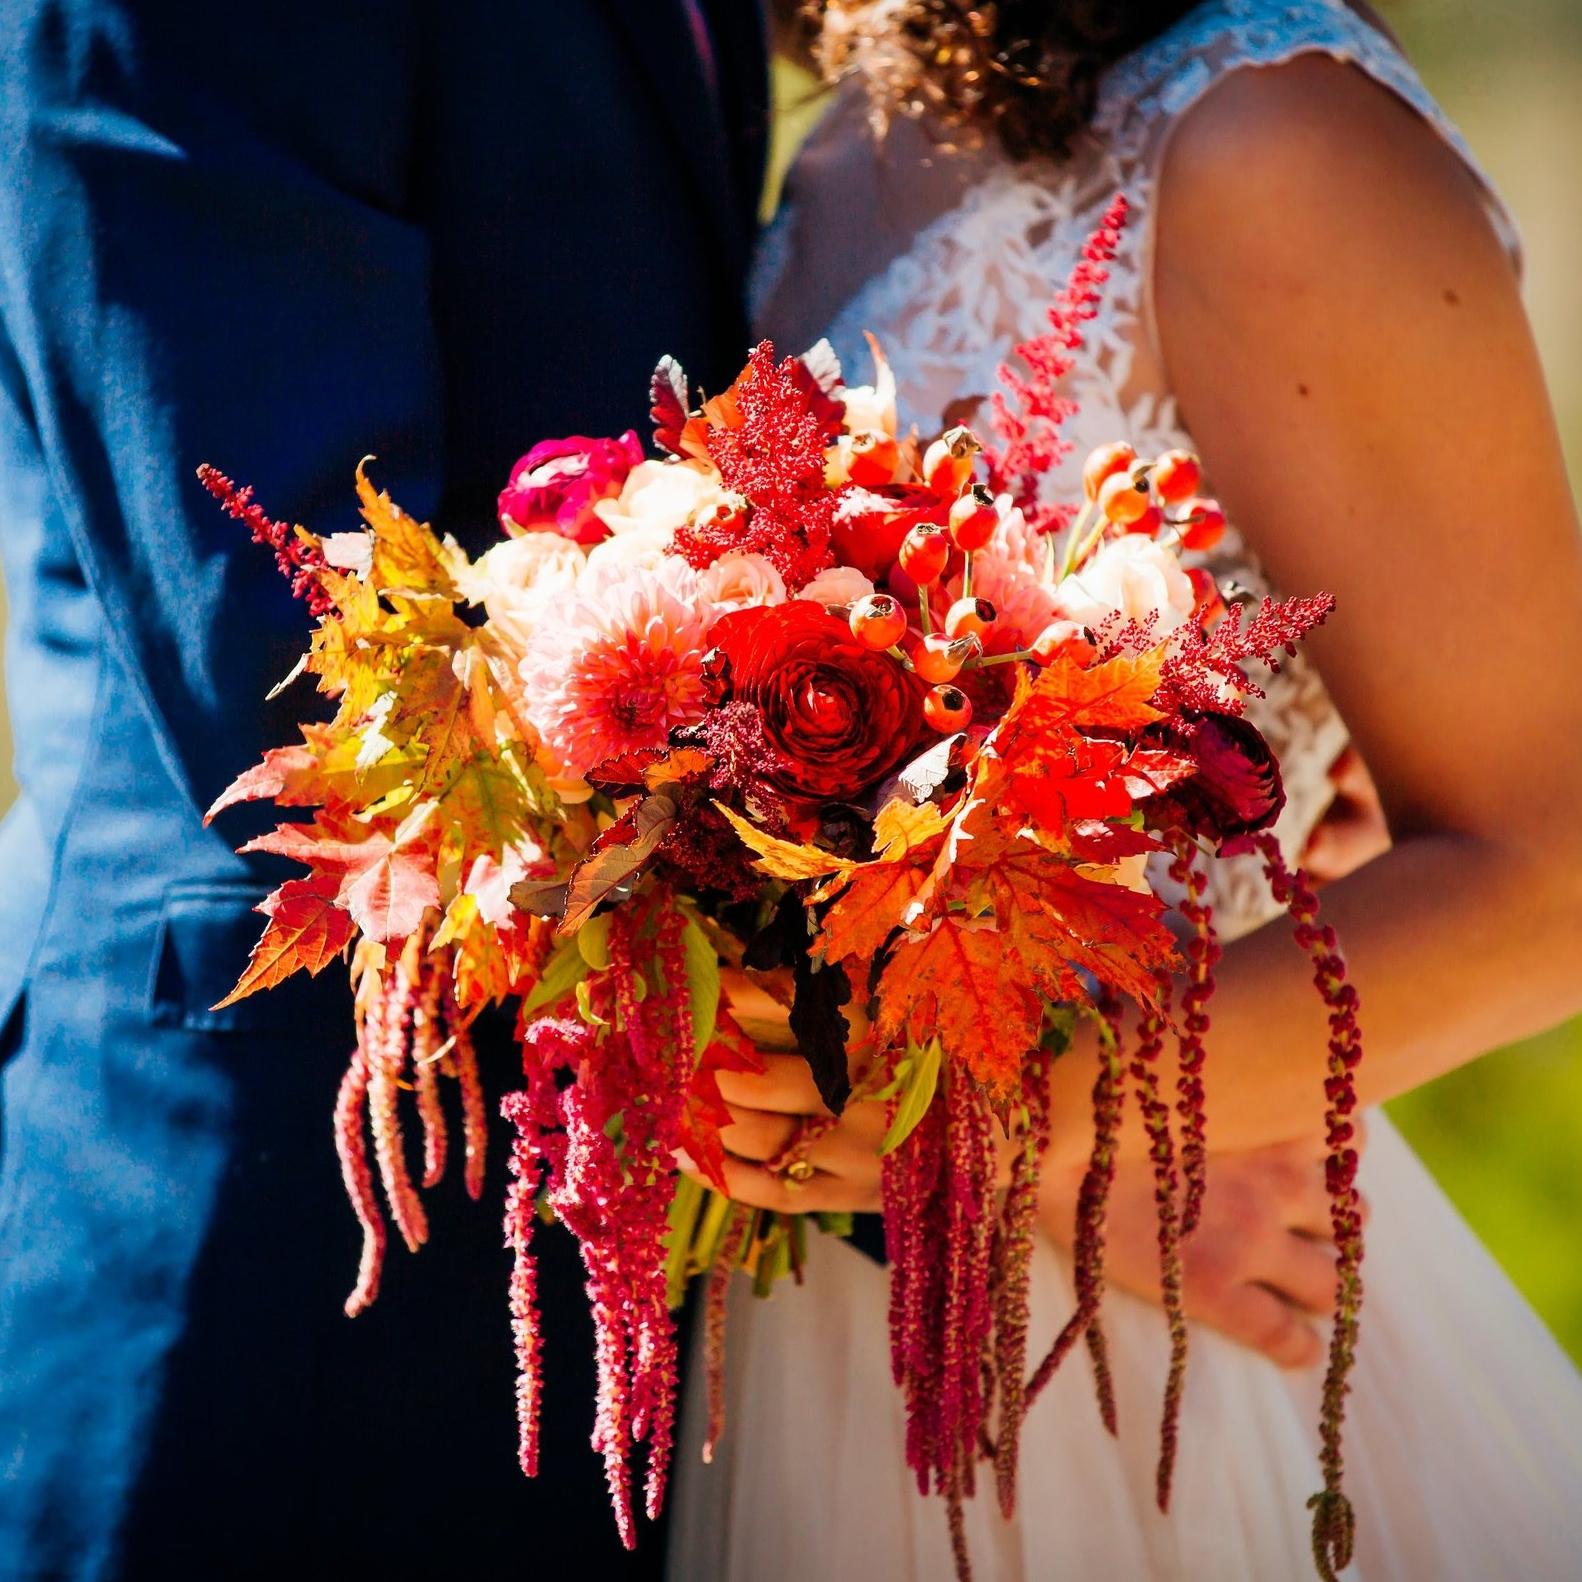 View Modern Fall Wedding Gallery